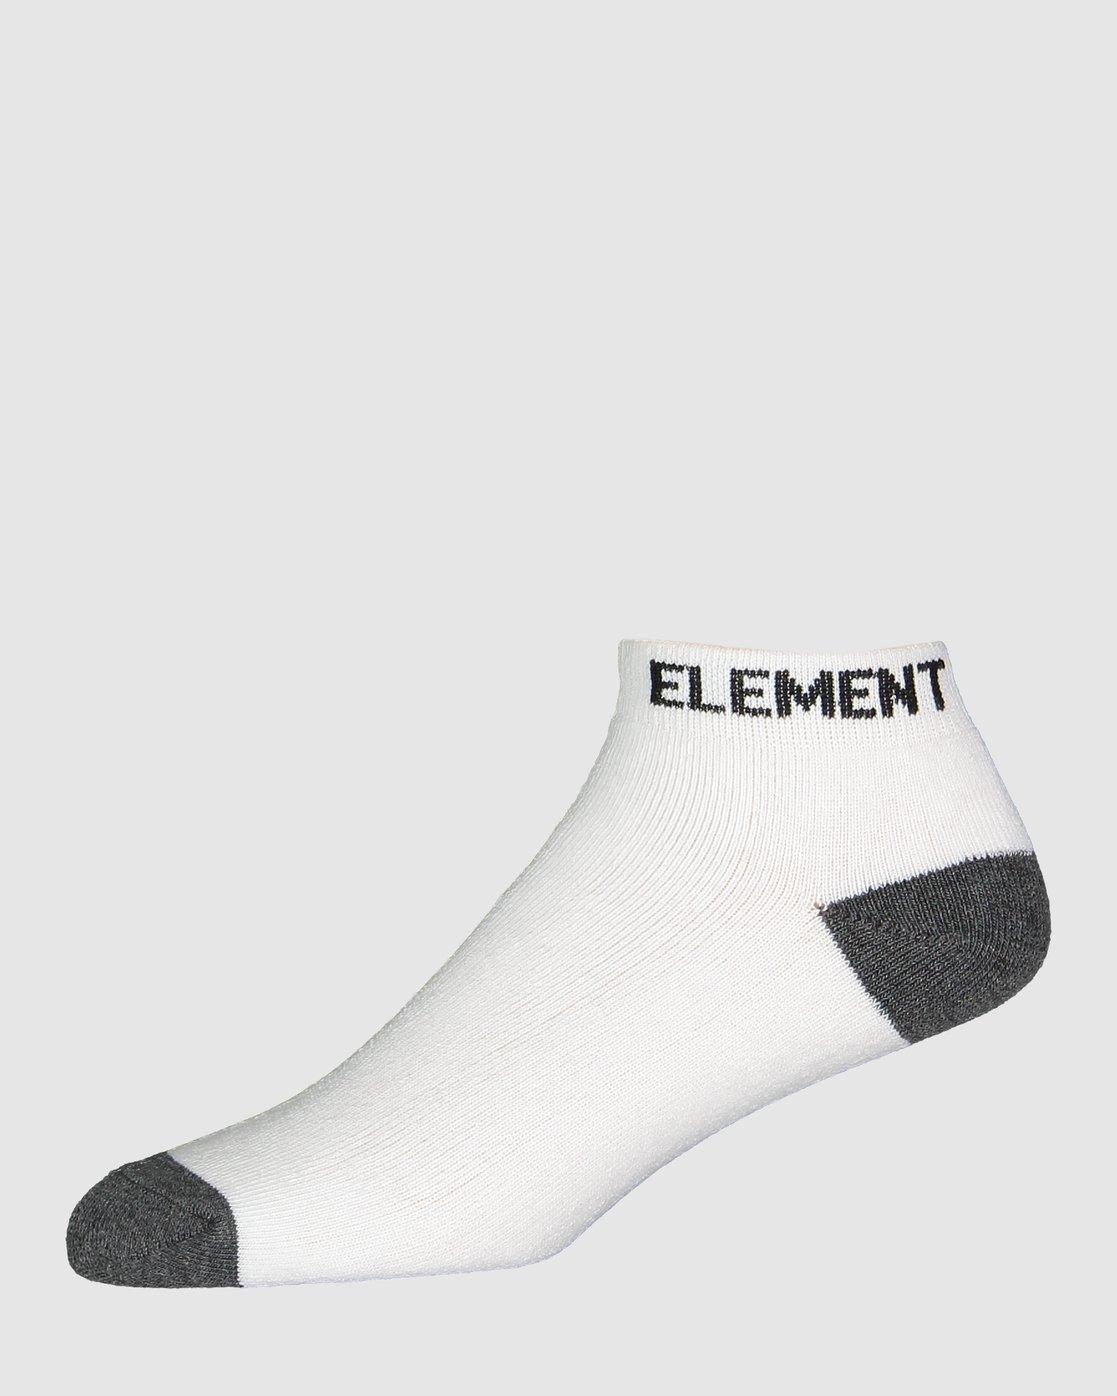 4 Ankle Socks  5 Pack  173692 Element